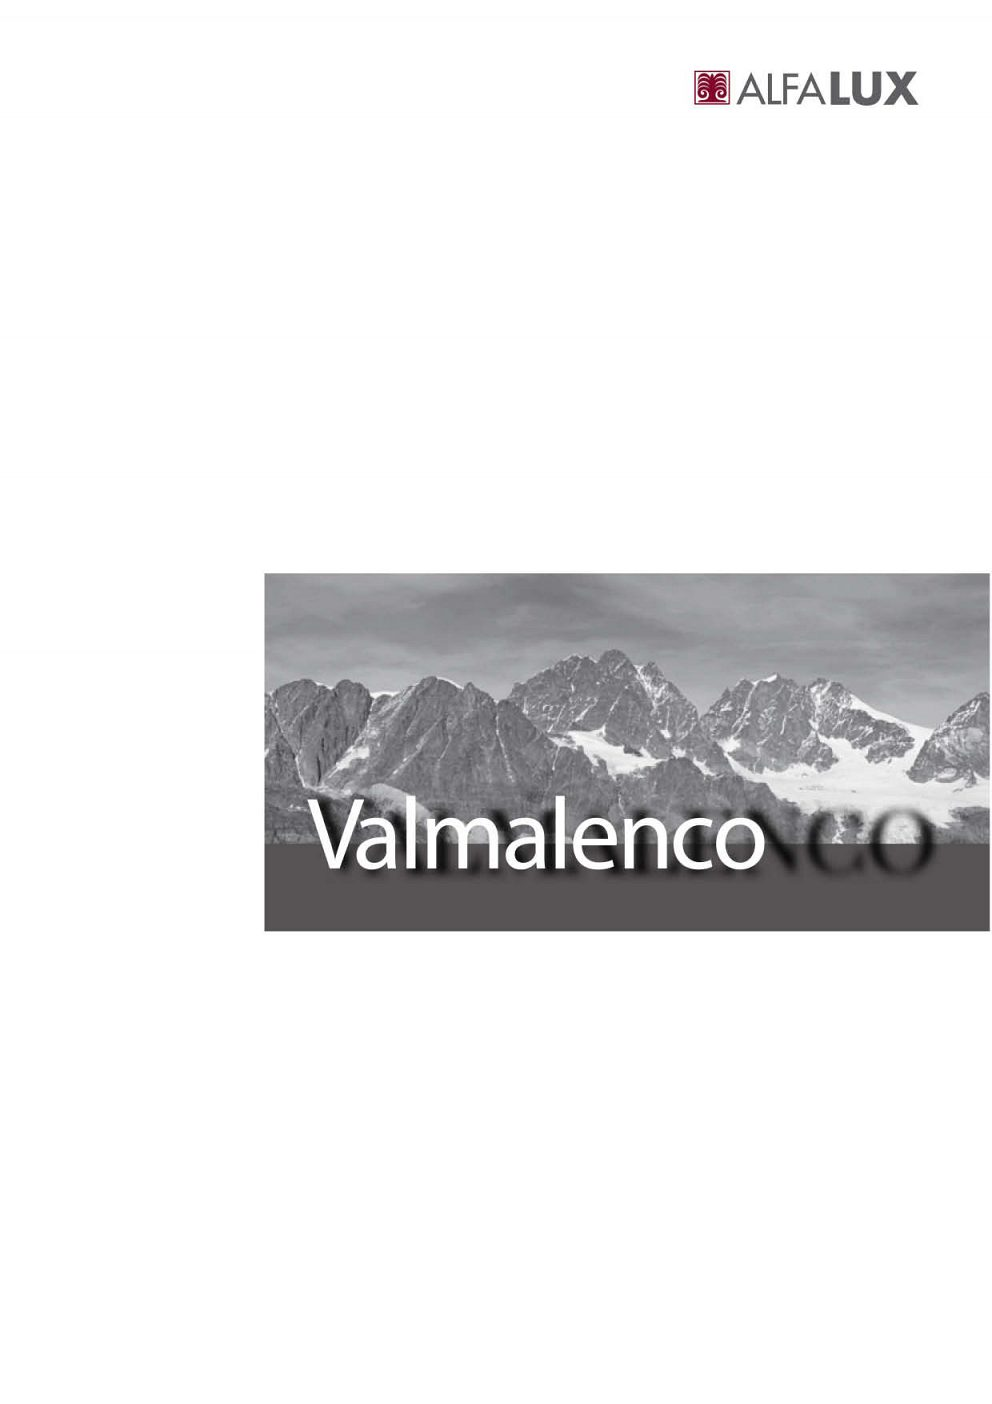 Alfalux - Valmalenco